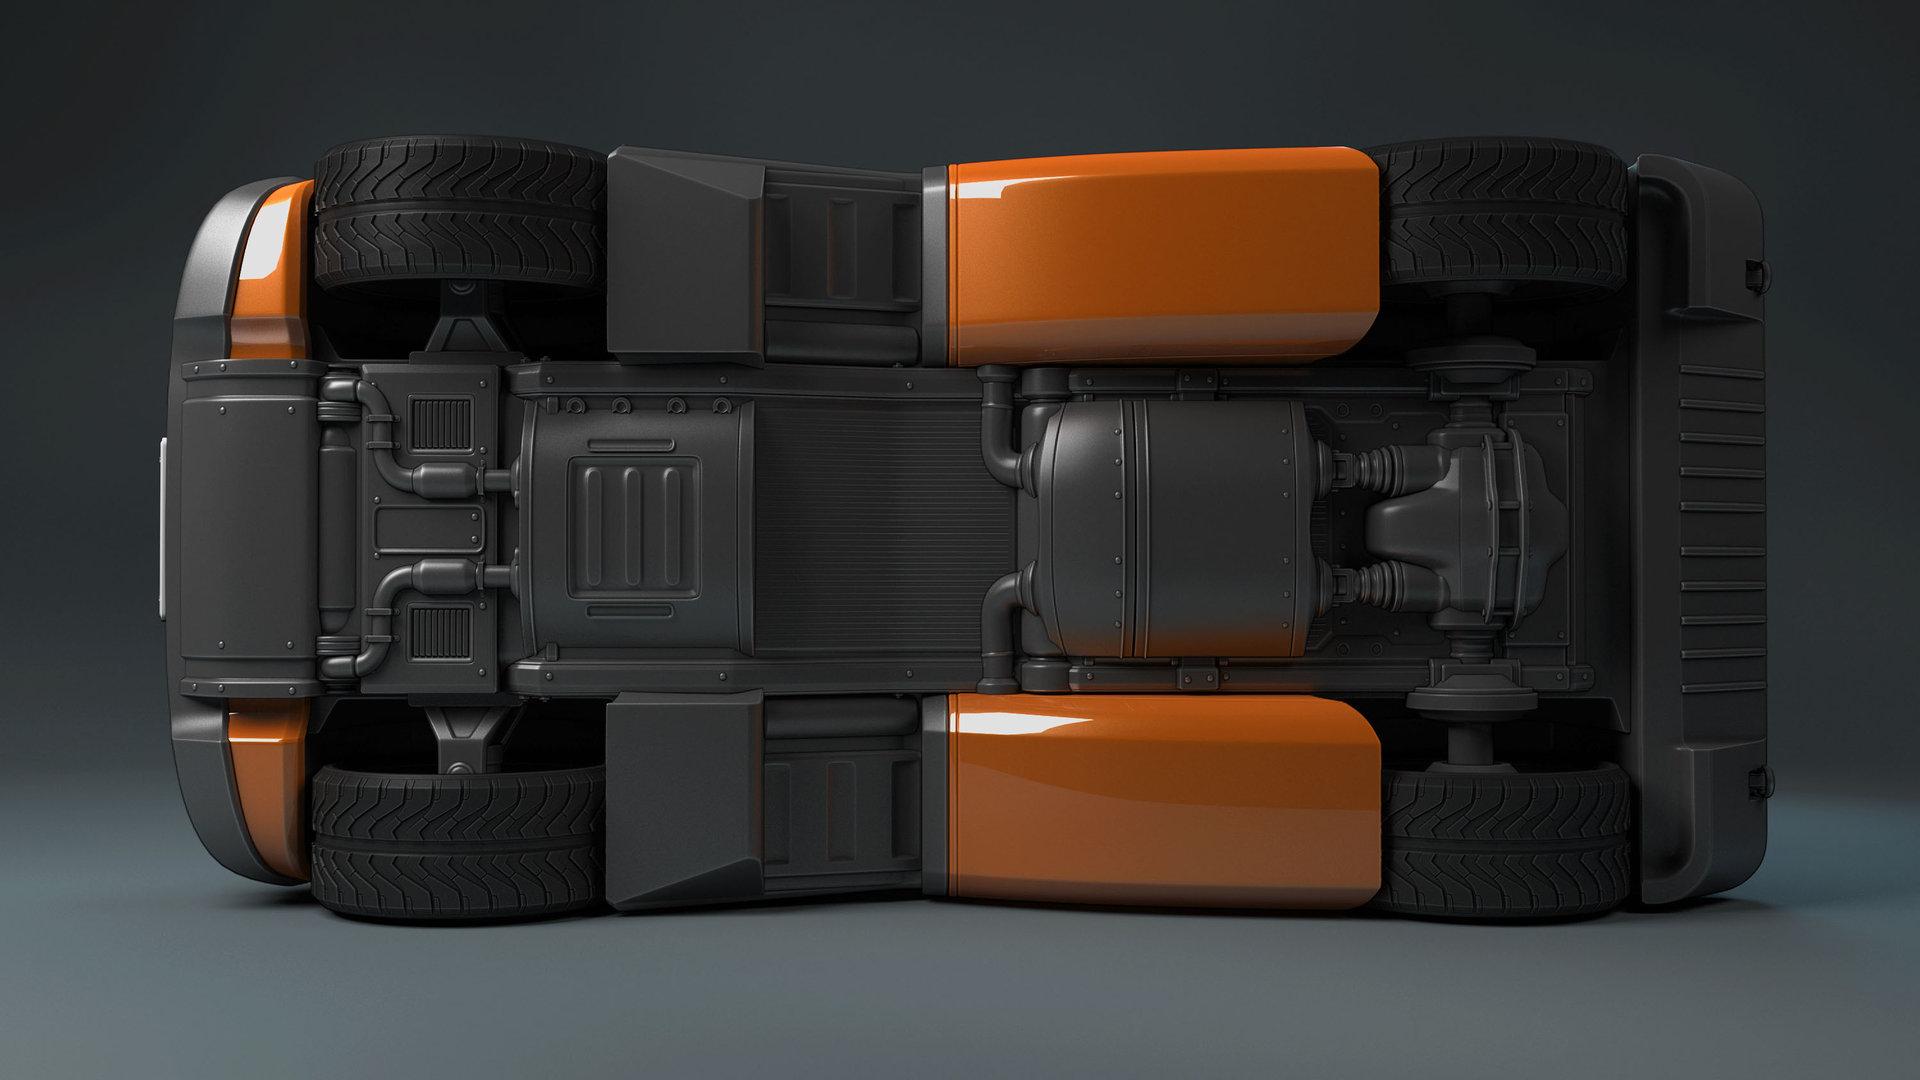 Mark van haitsma concept car bottom